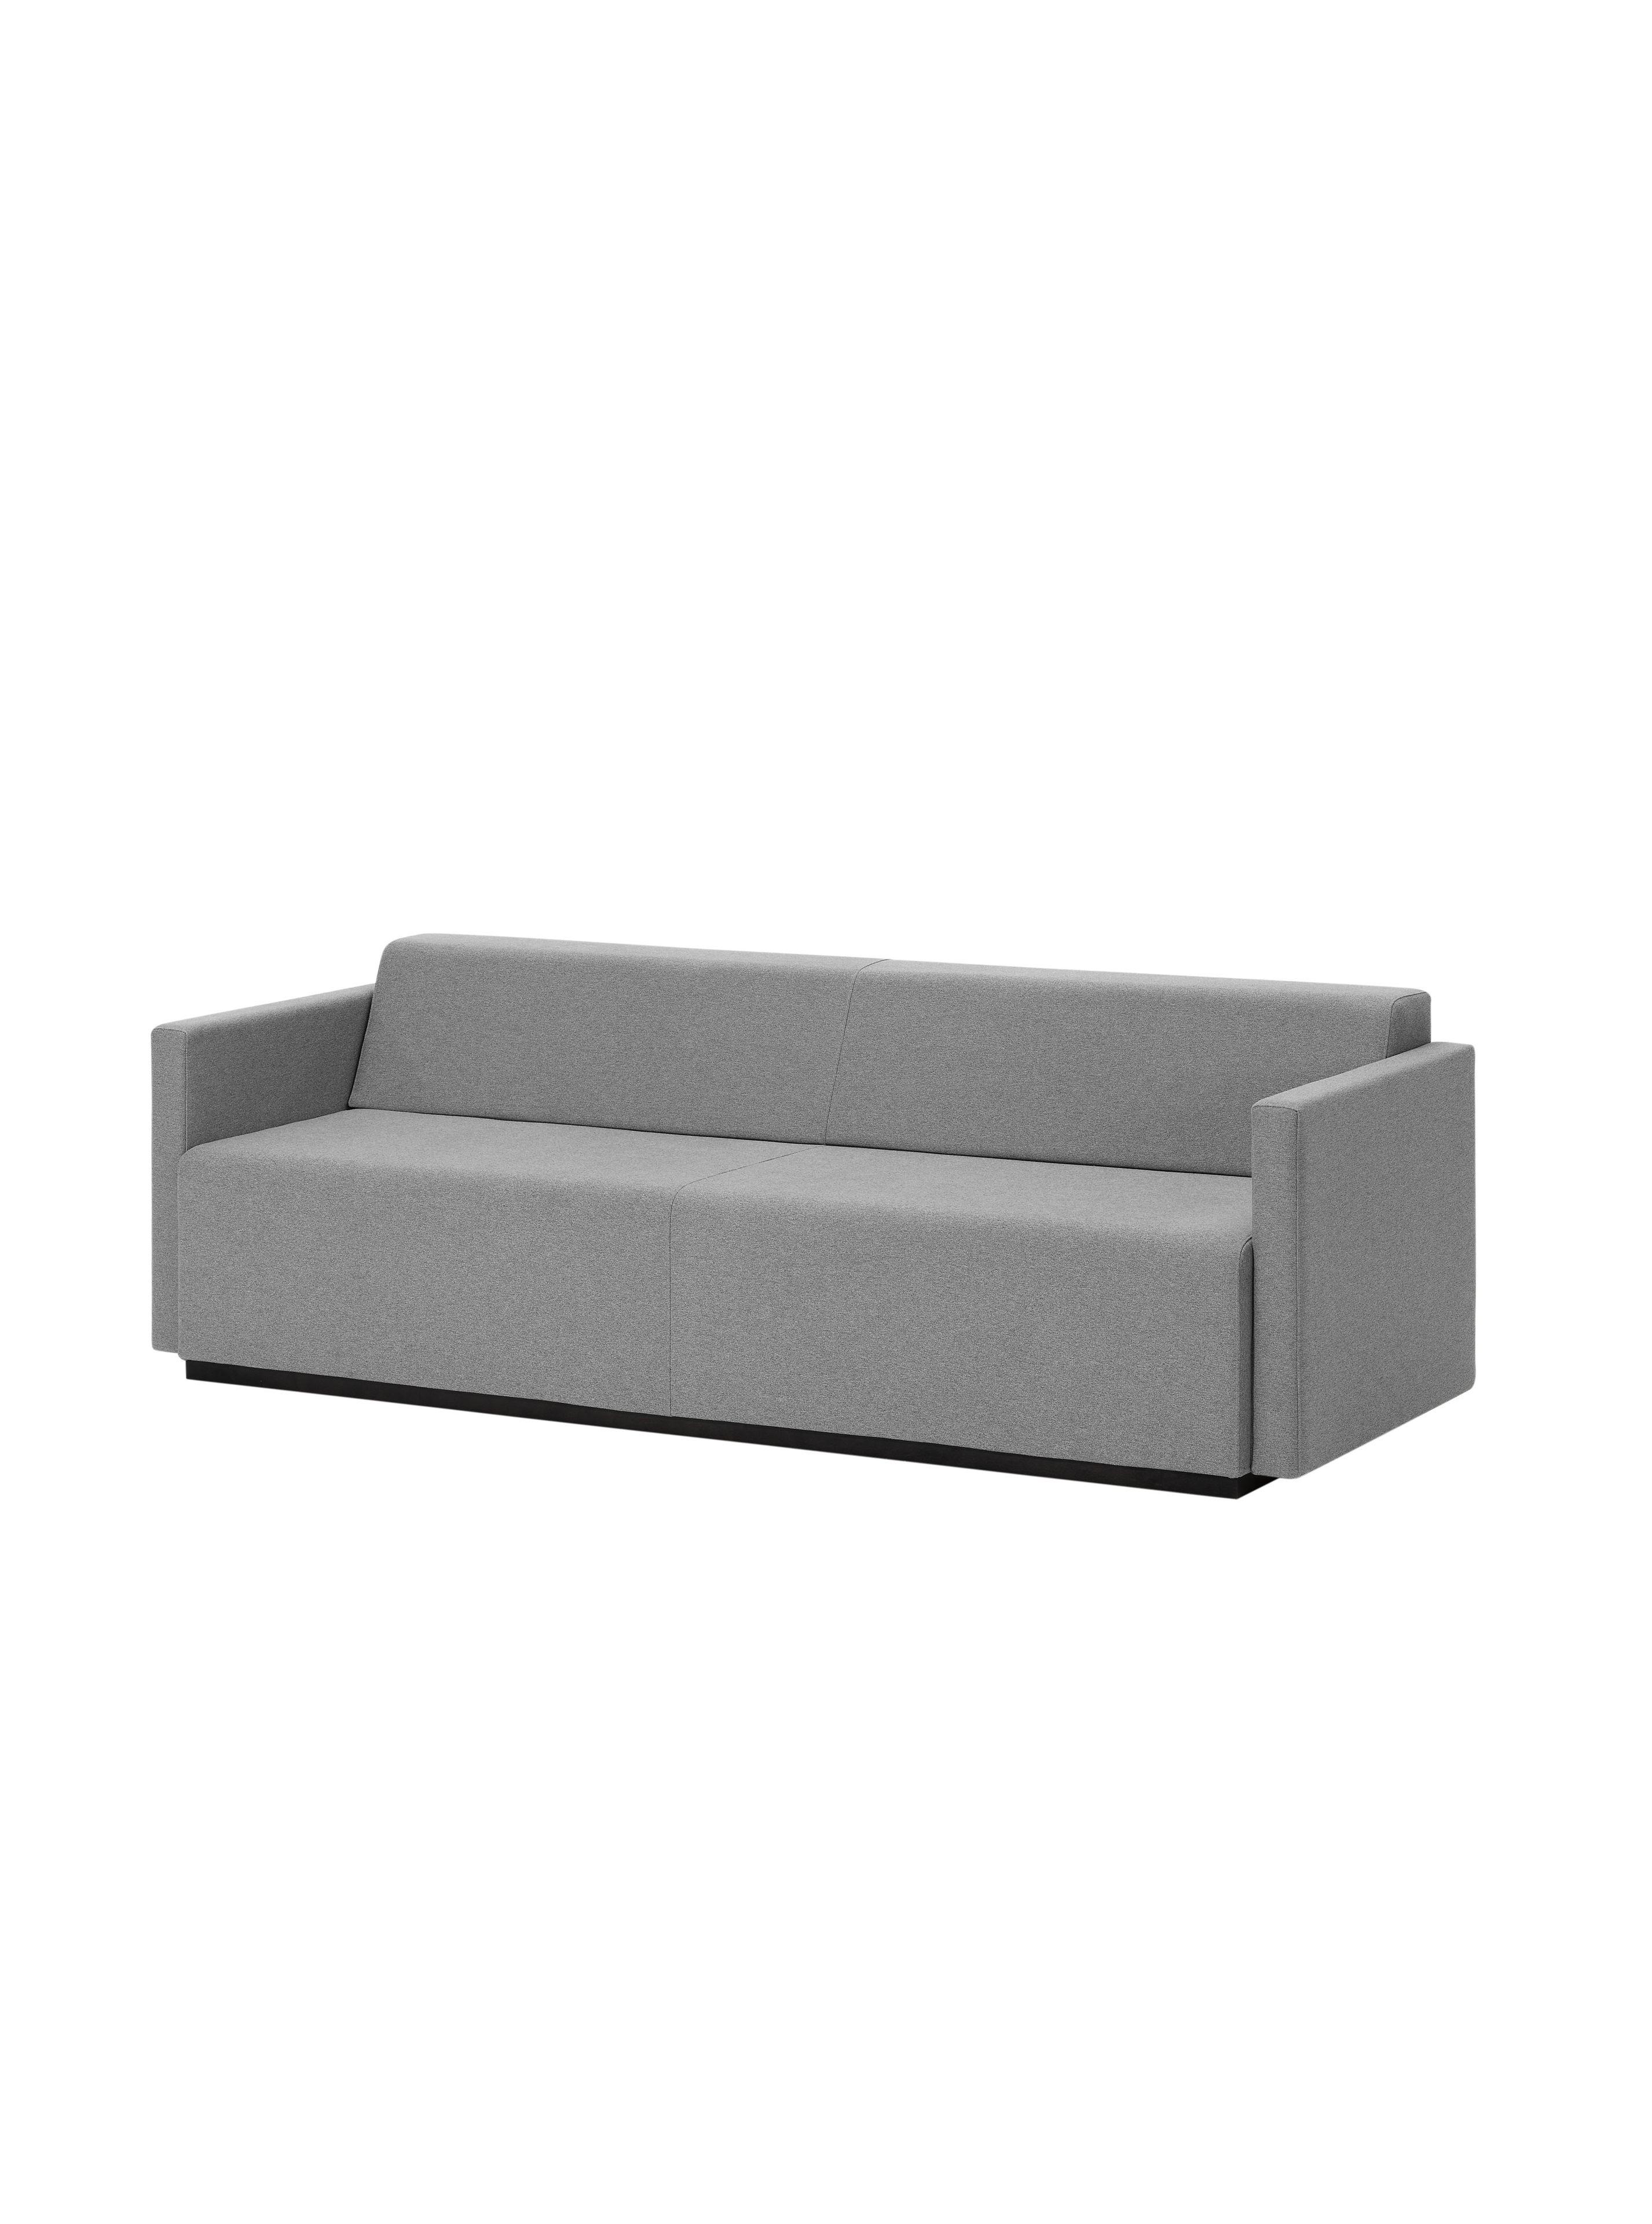 pau canap composable by inclass mobles. Black Bedroom Furniture Sets. Home Design Ideas